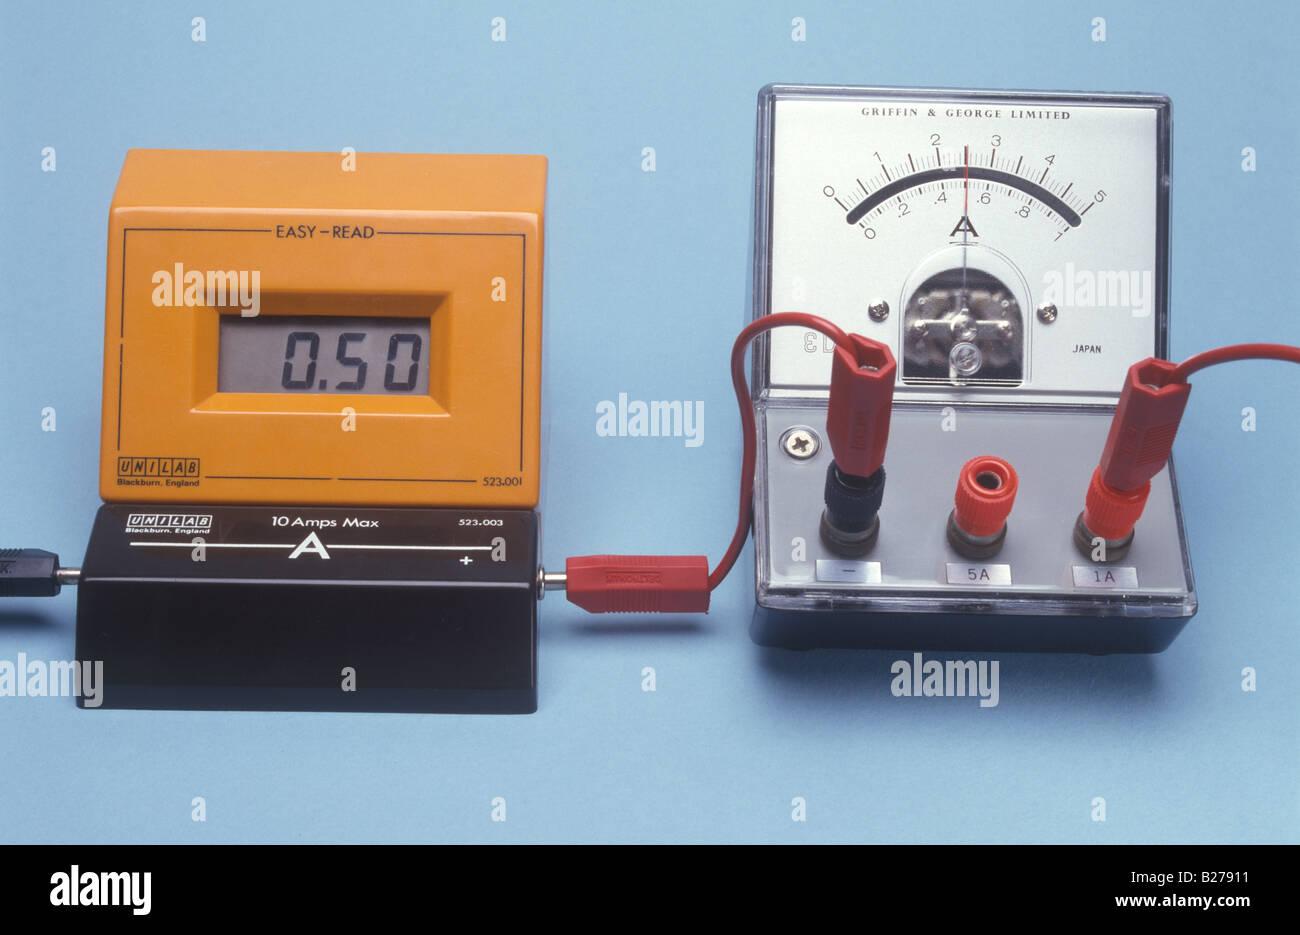 digital & analogue ammeters both reading 0.5 amp - Stock Image